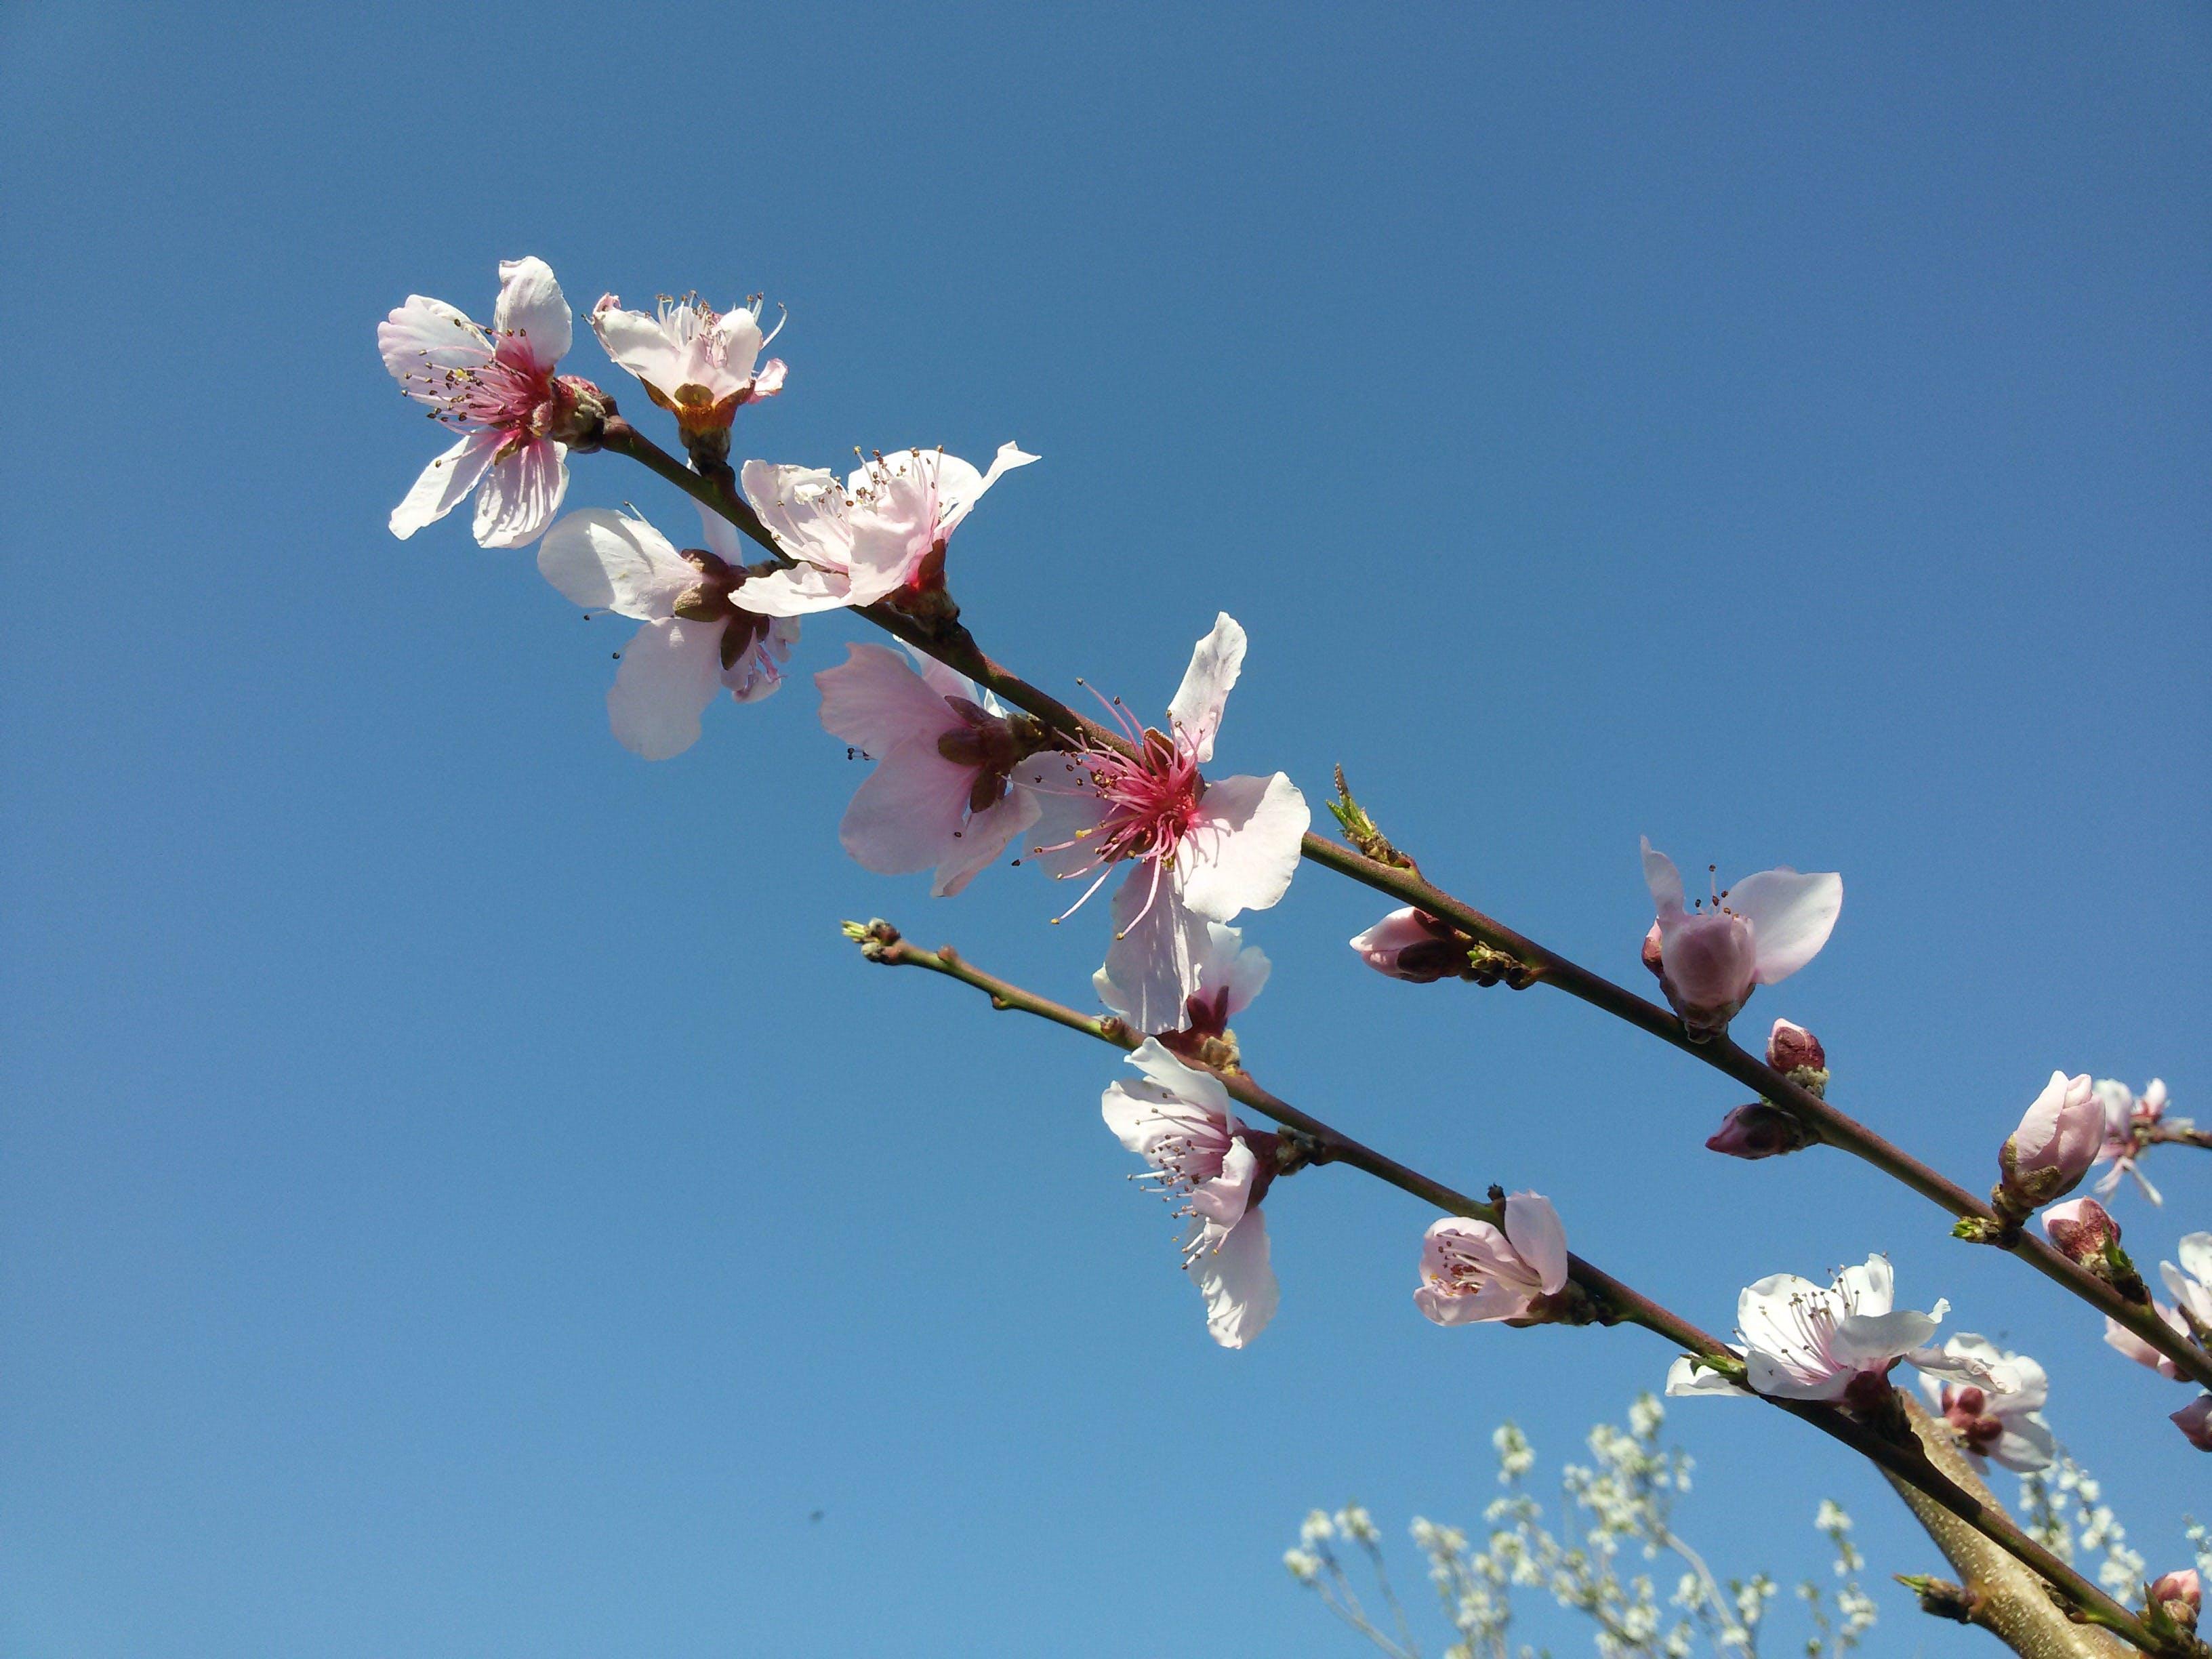 Free stock photo of شکوفه هاب بهاری